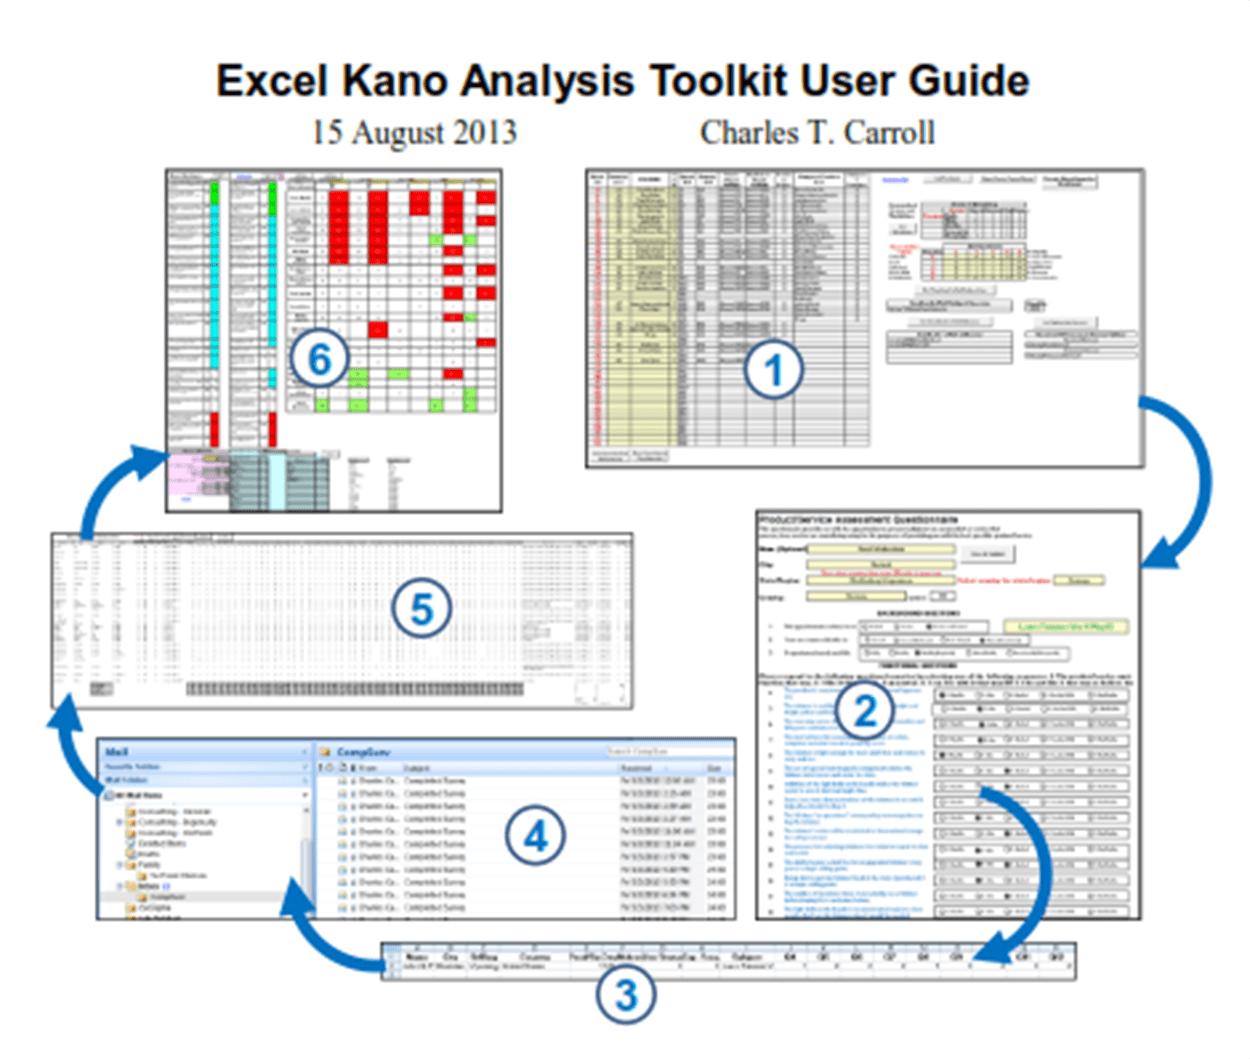 kano analysis excel toolkit  u2013 isixsigma